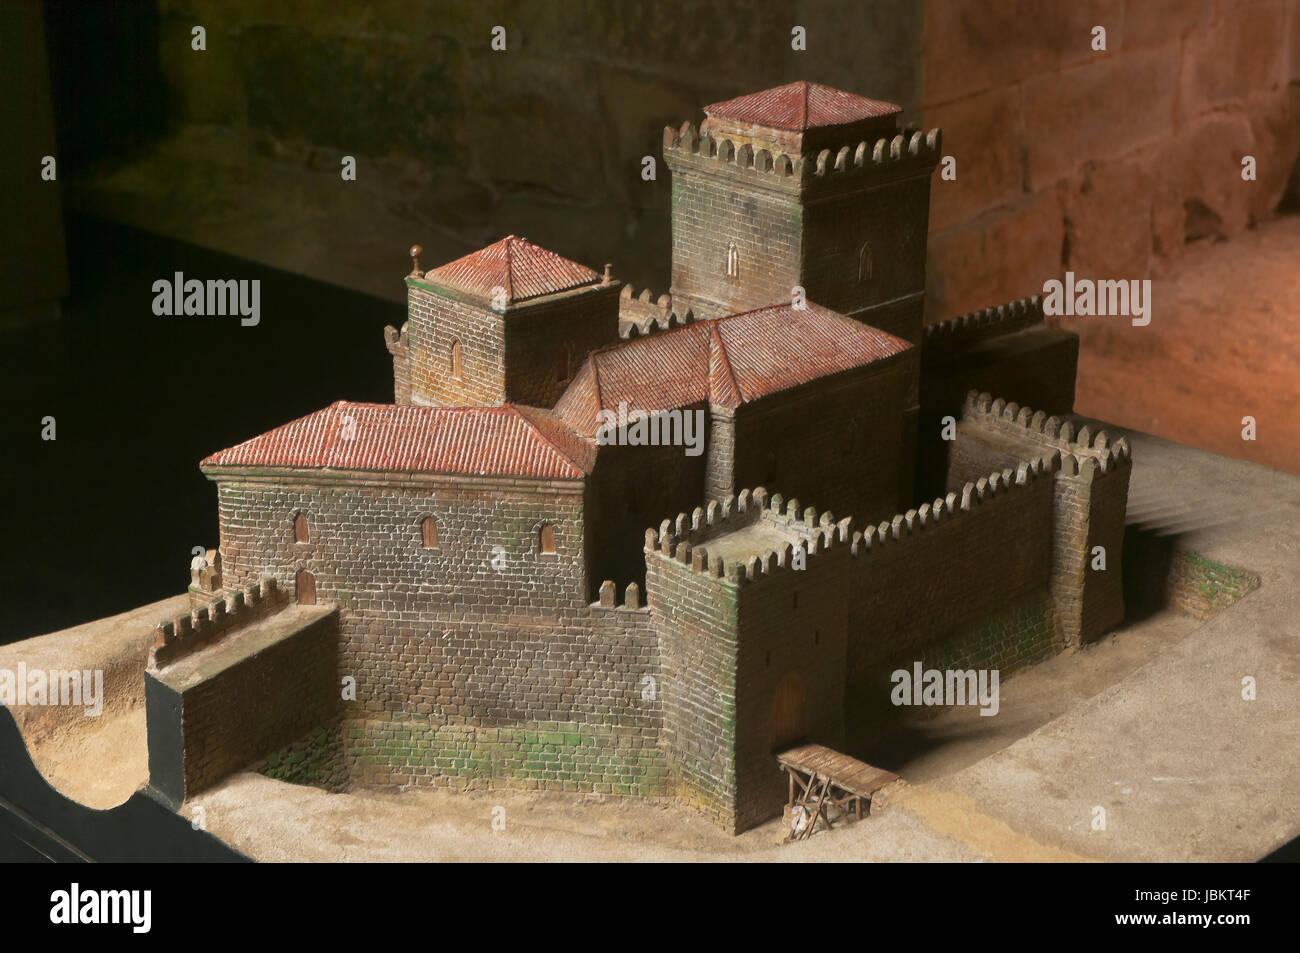 Interpretation Center of the Archbishop's Towers - CITA, Pontevedra, Region of Galicia, Spain, Europe - Stock Image